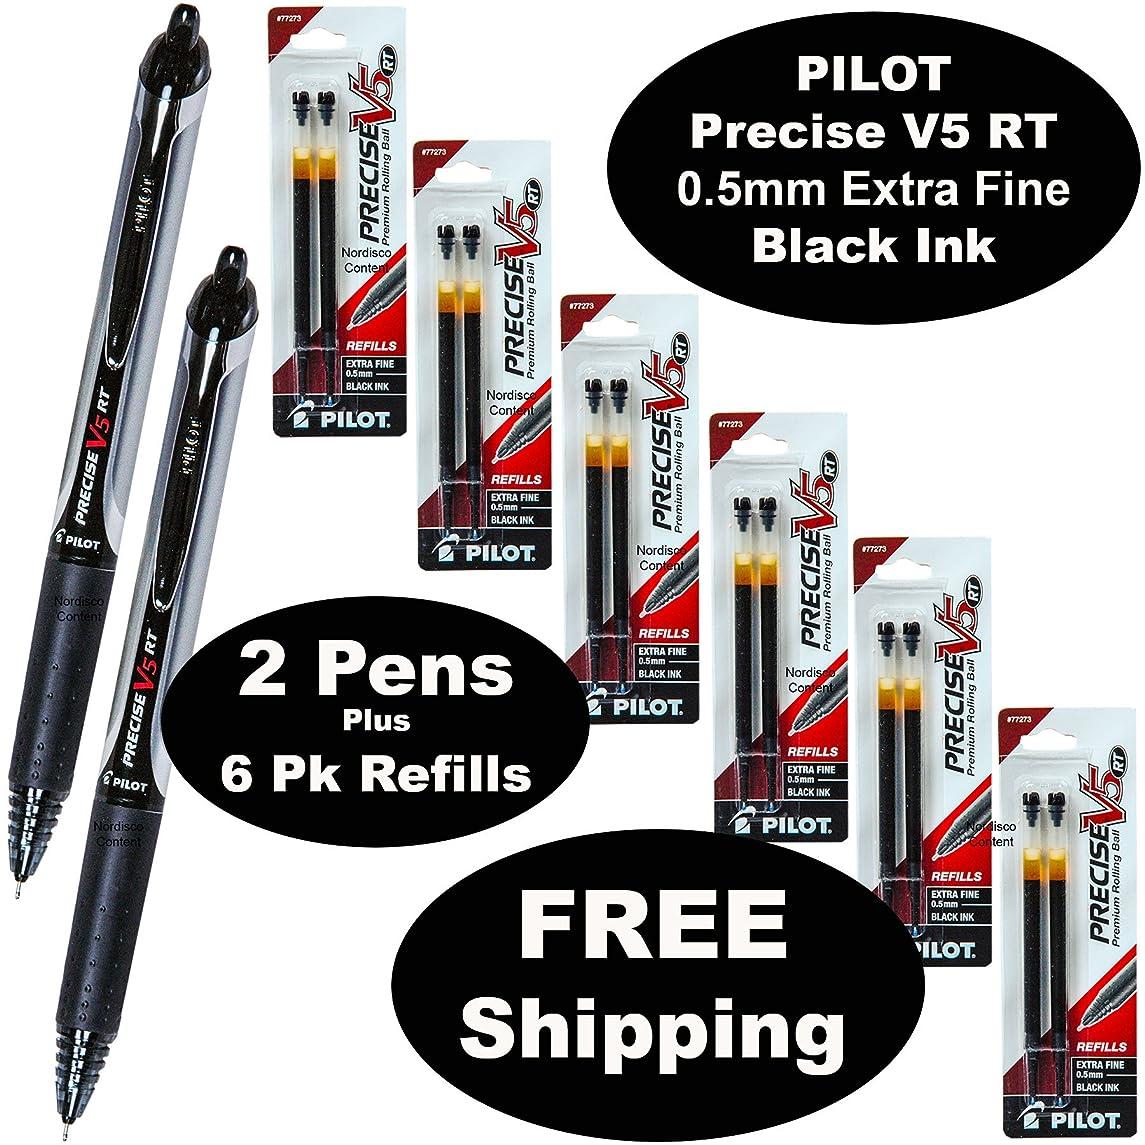 Pilot Precise V5 Rt, 2 Pens 26062 with 6 Packs of Refills, Black Ink, 0.5mm X-fine